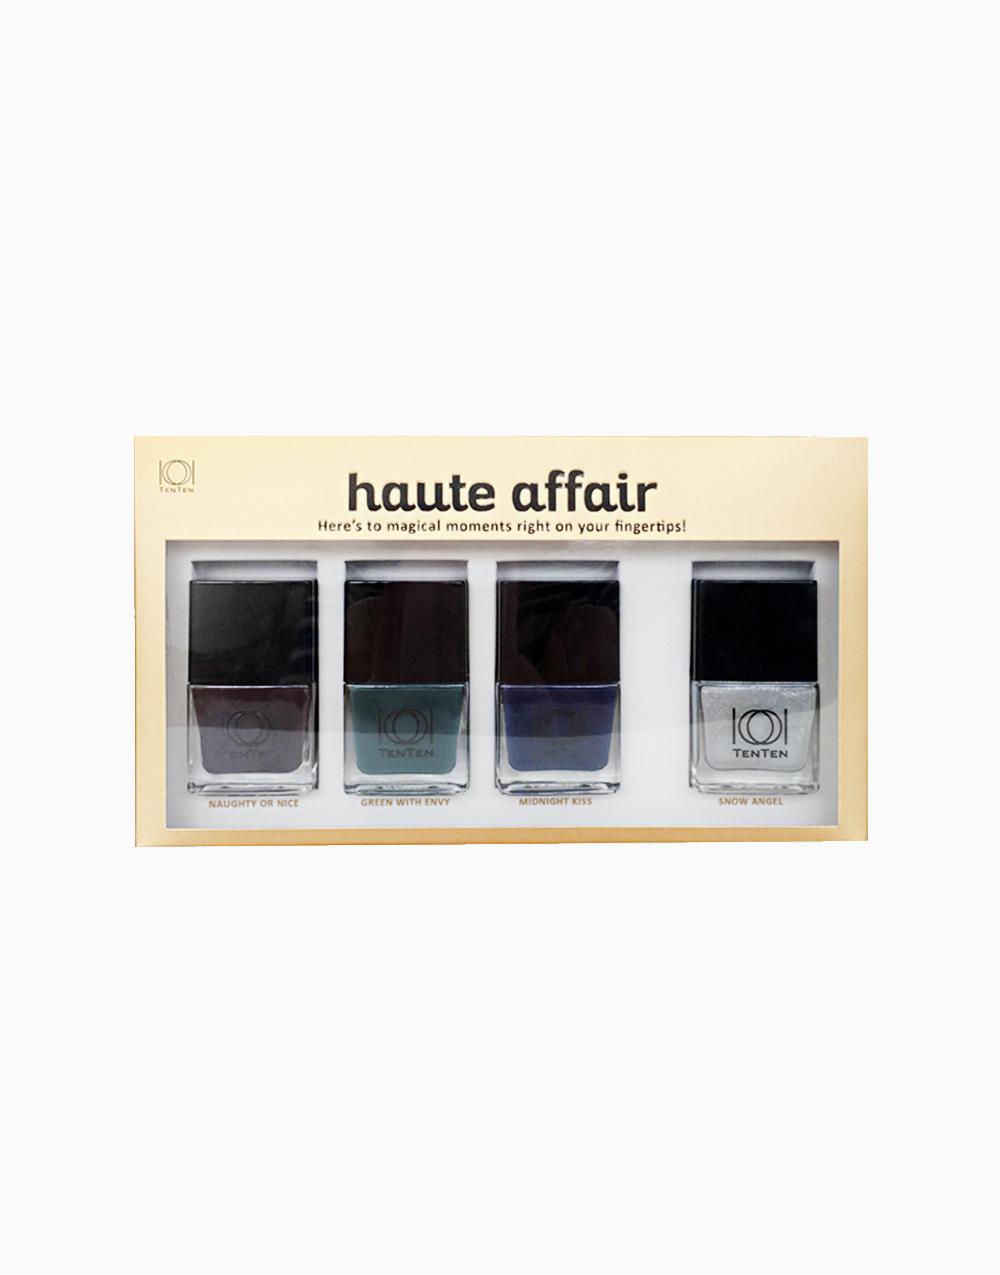 Tenten Haute Affair Holiday Collection by Tenten